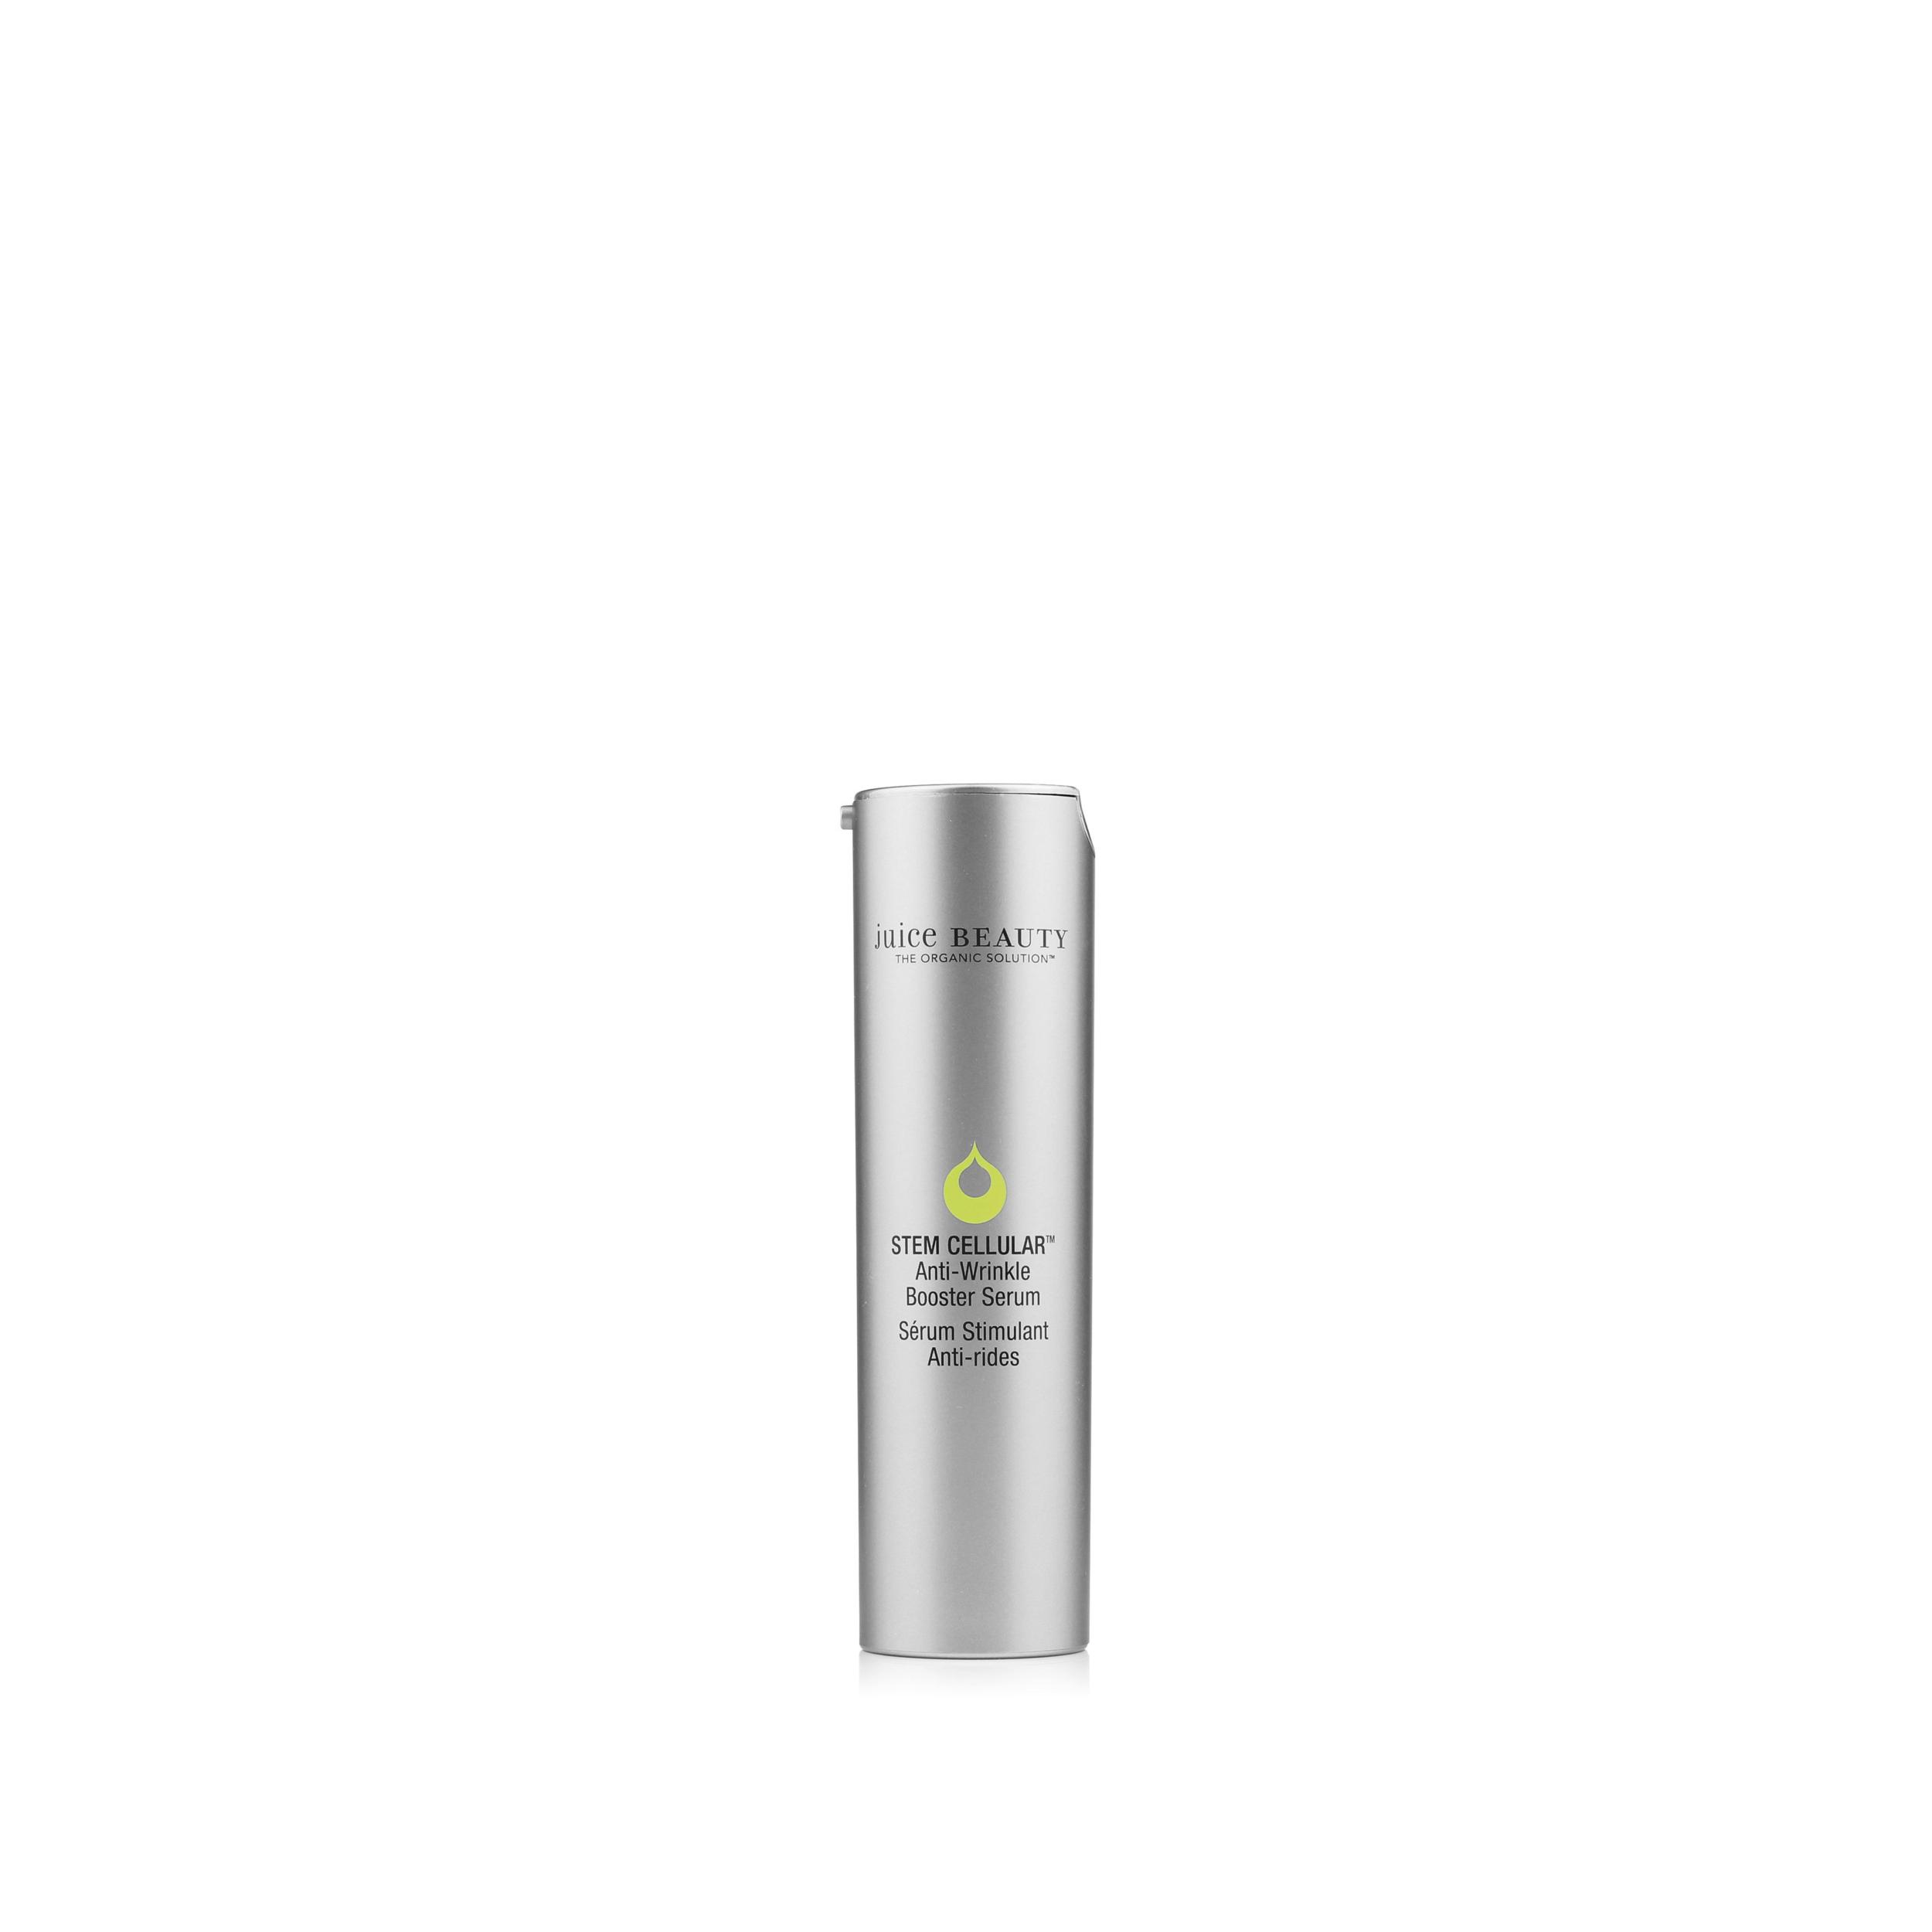 Stem Cellular Anti-Wrinkle Booster Serum